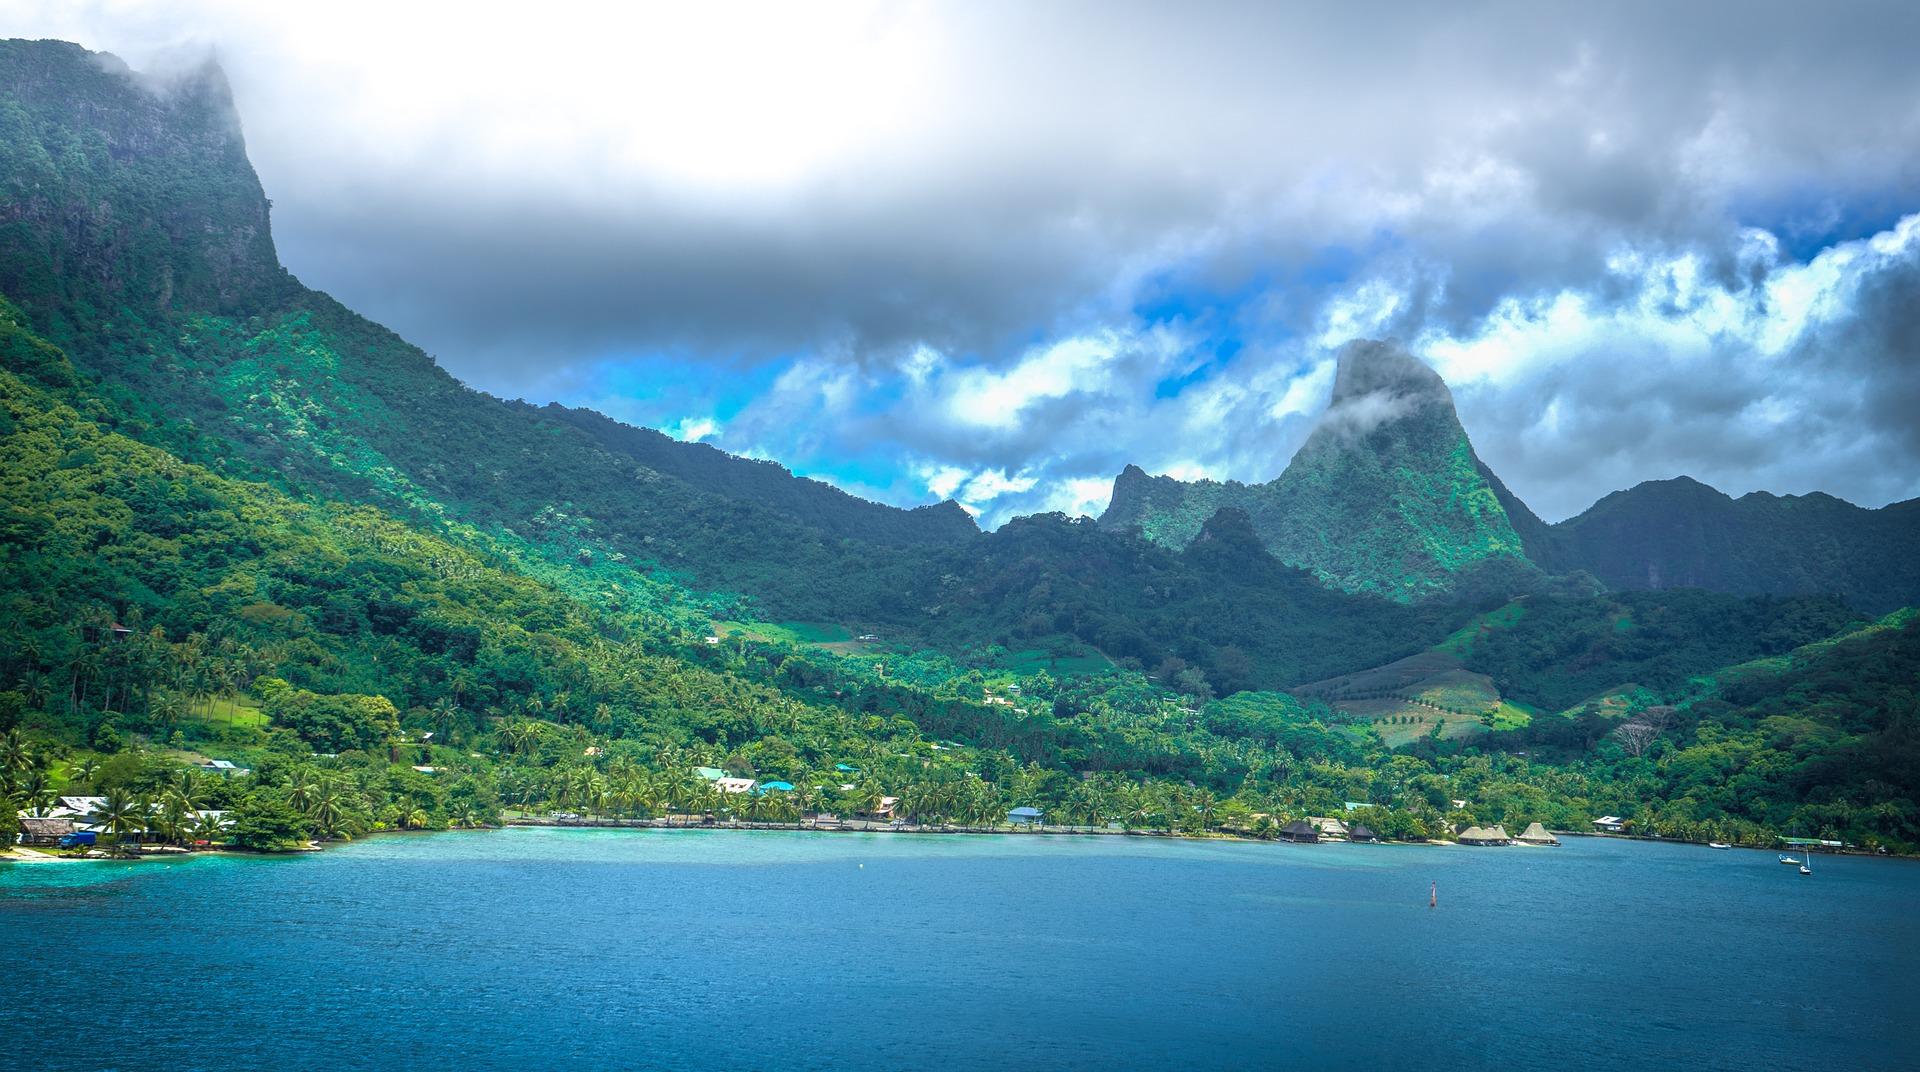 San Francisco e Polinesia | Parti con Expotur Viaggi!